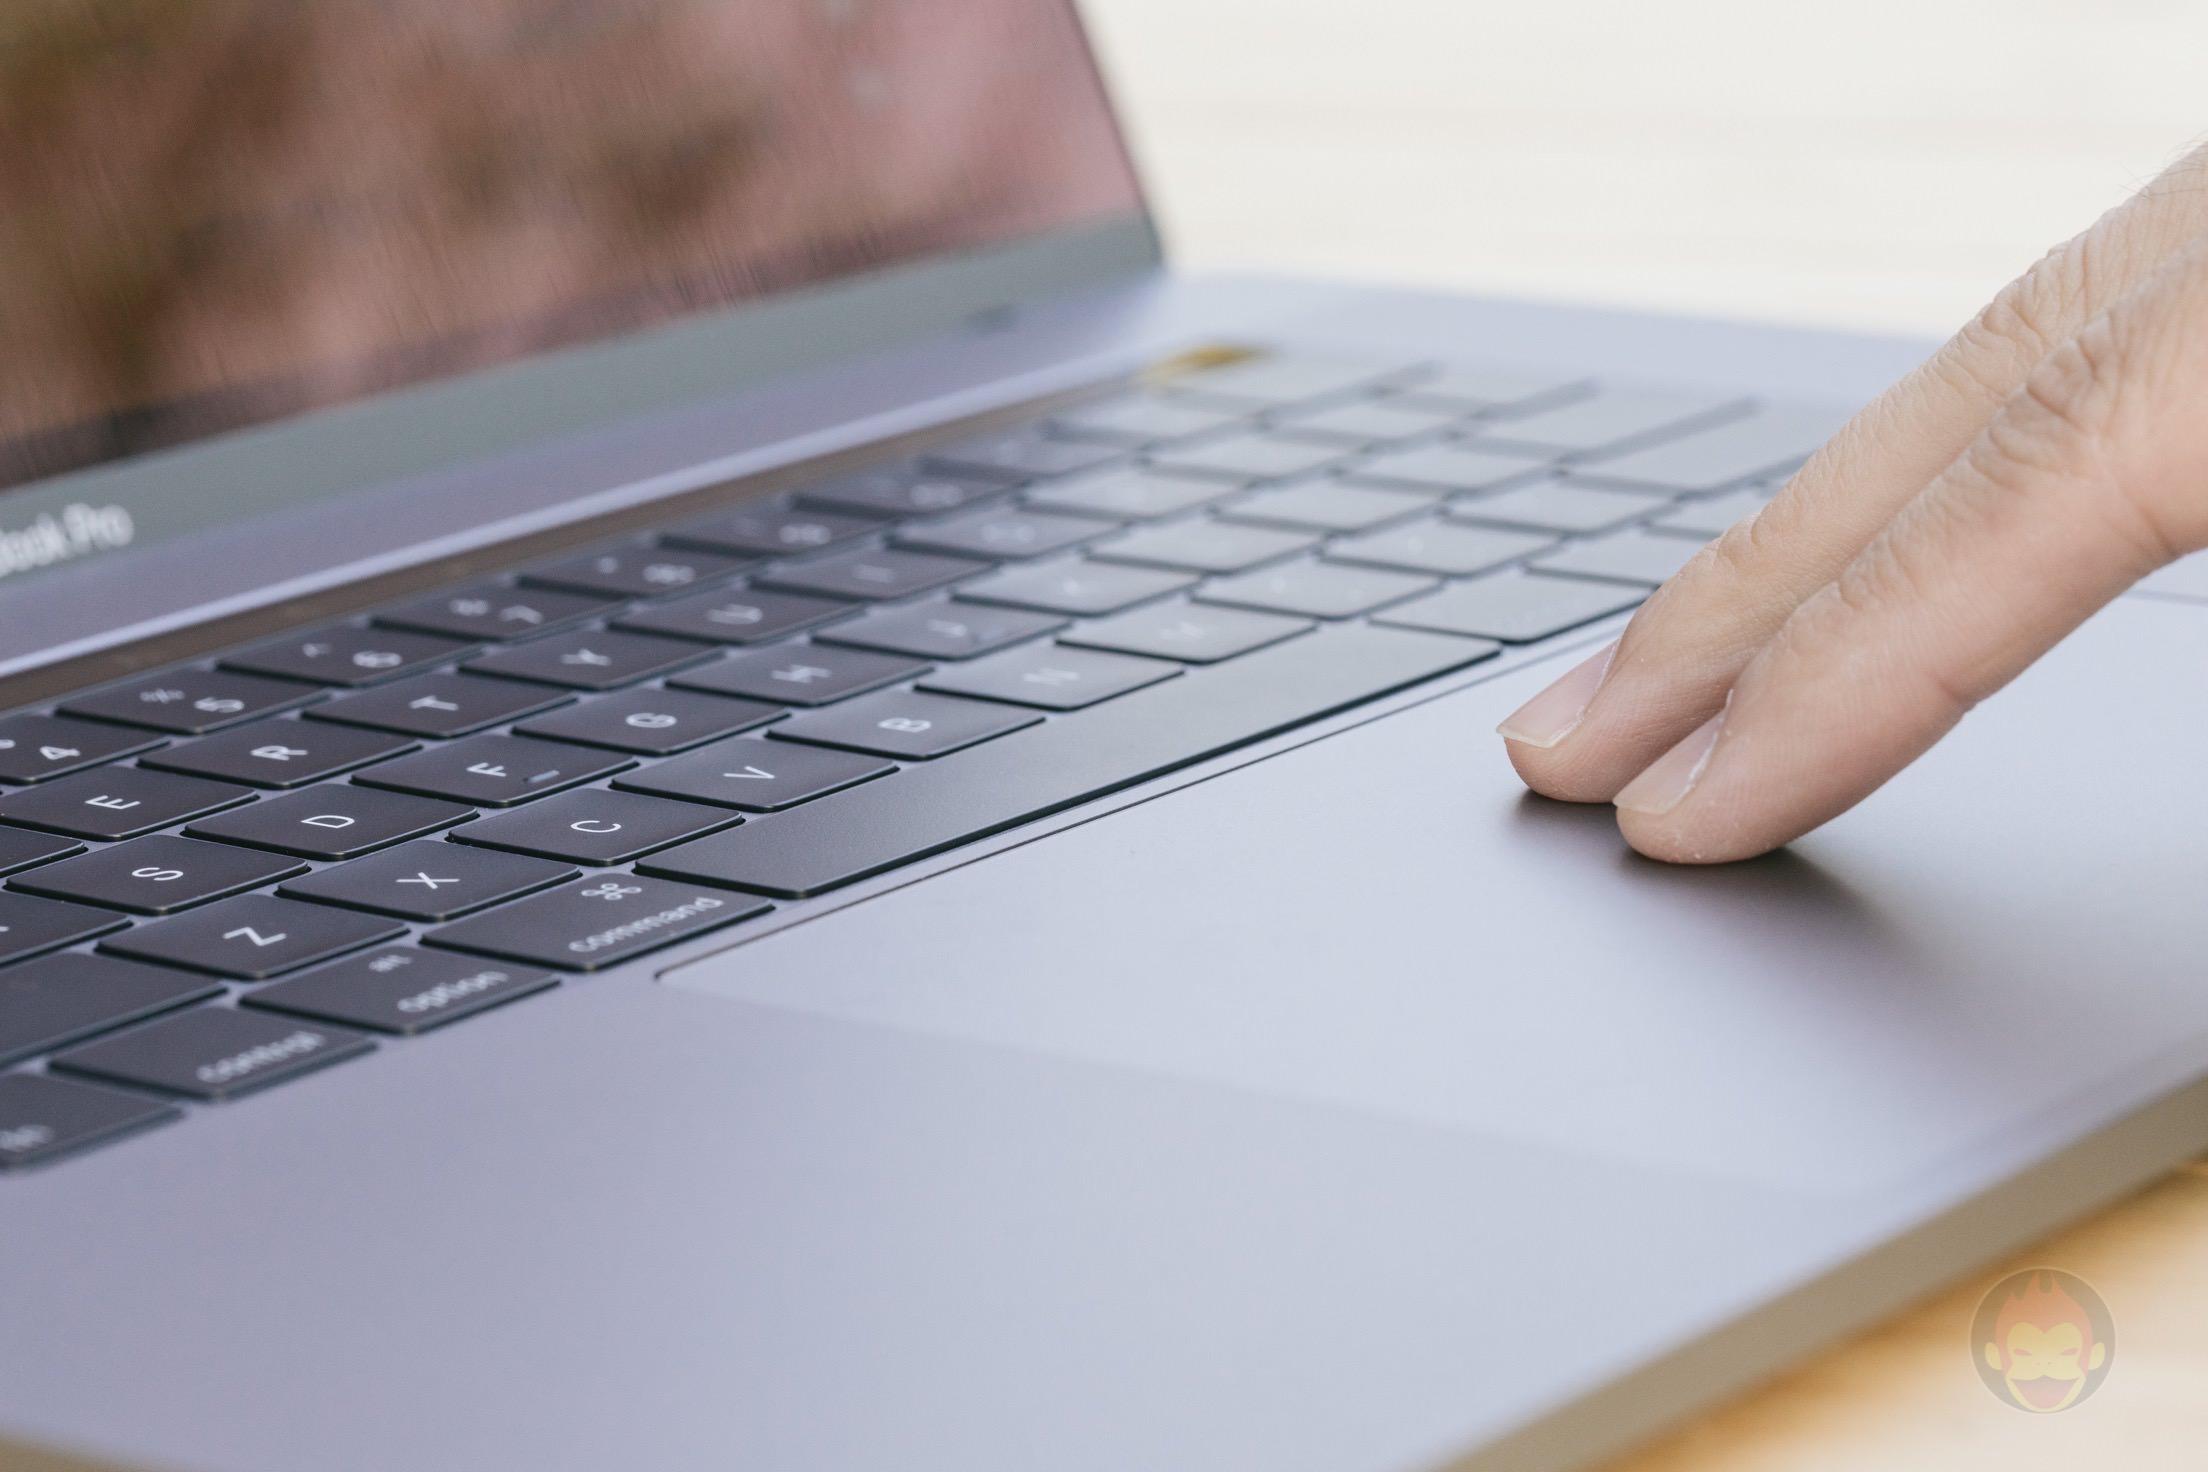 MacBook-Pro-Late2016-15inch-Model-Trackpad-04.jpg